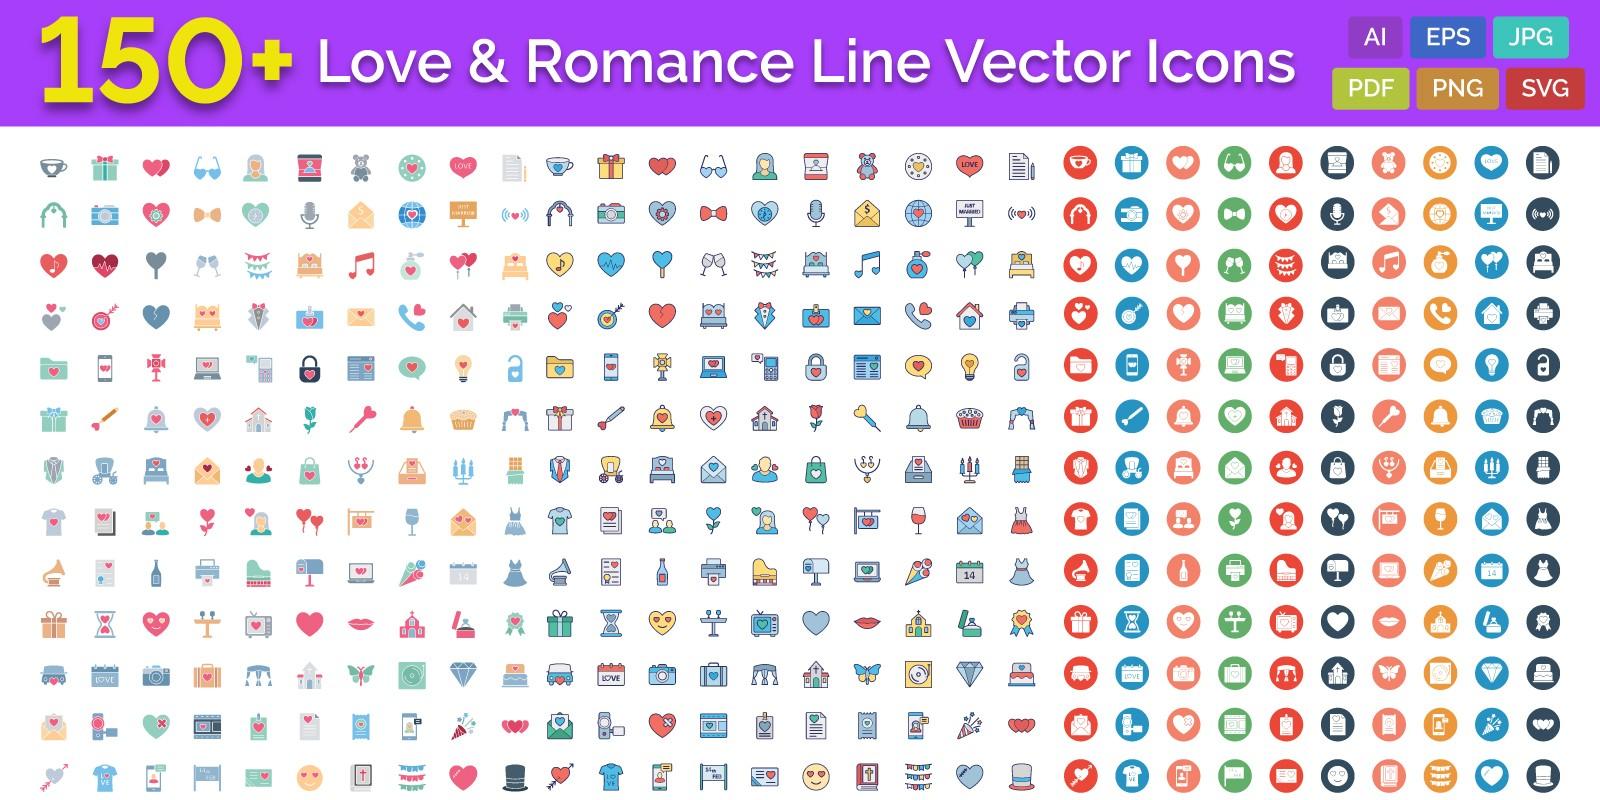 150 LoveAnd Romance Line Vector Icons